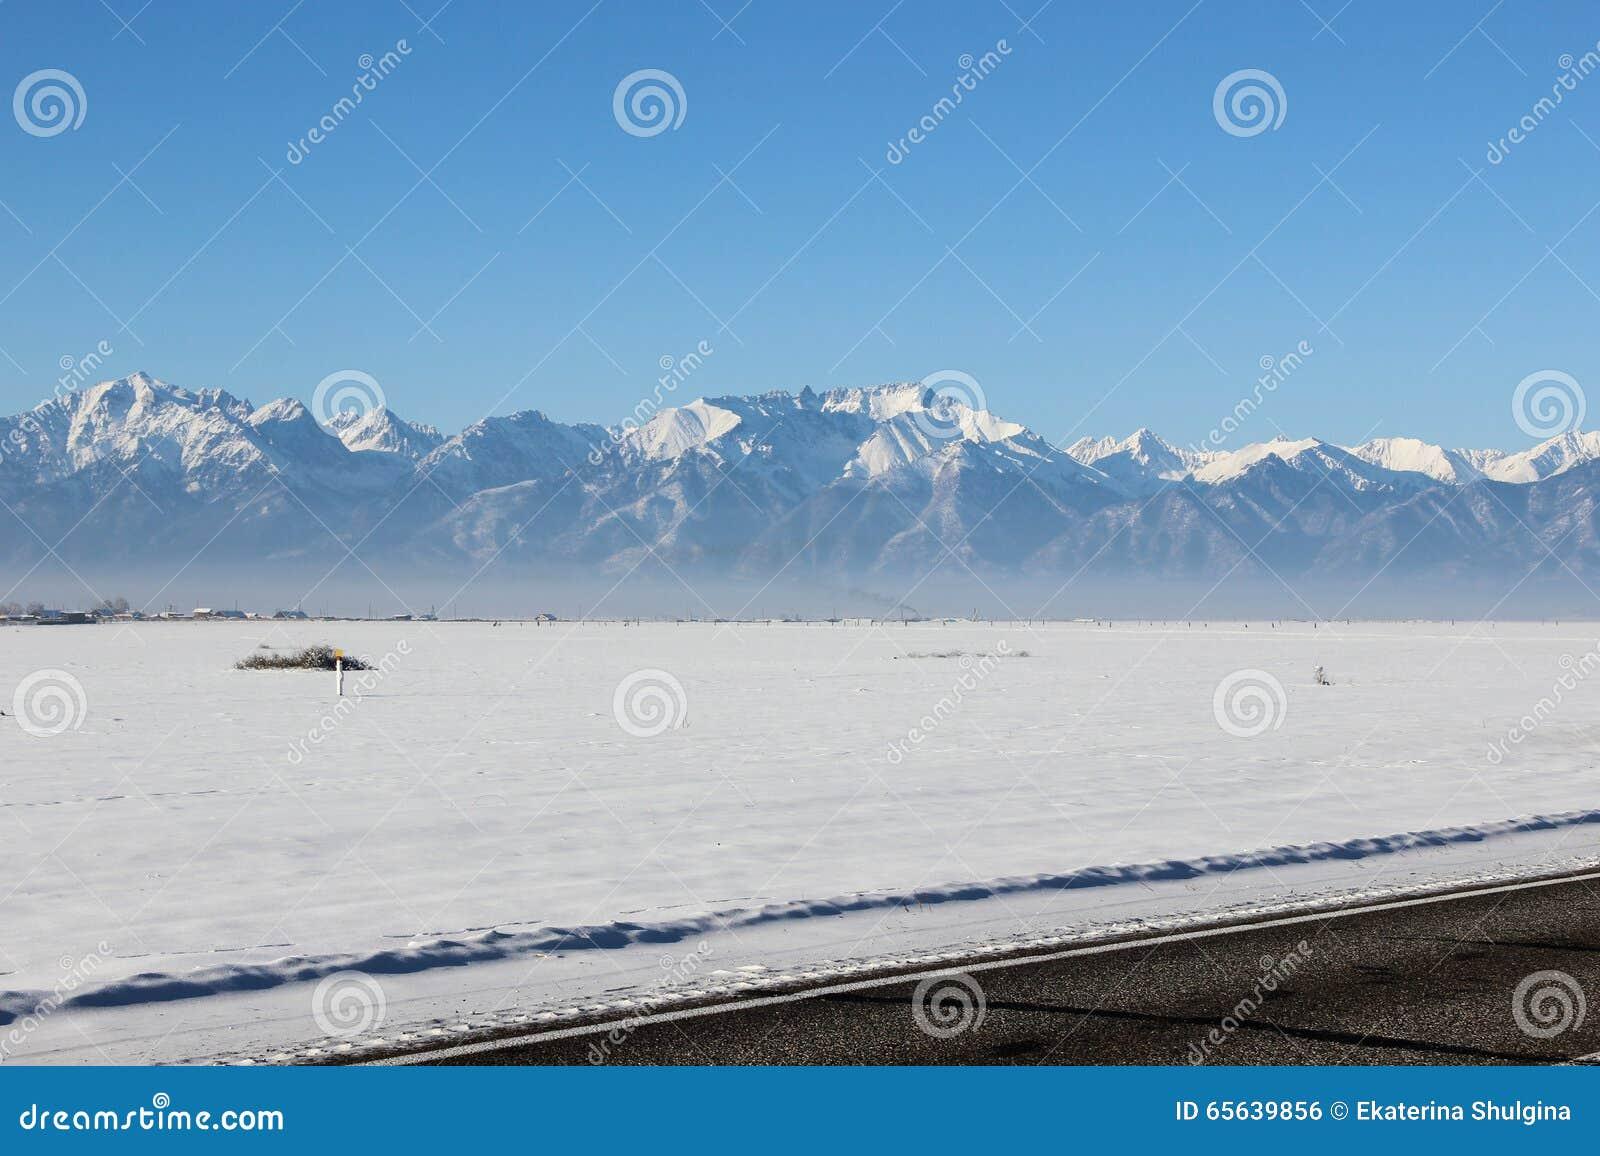 La vallée couverte de neige